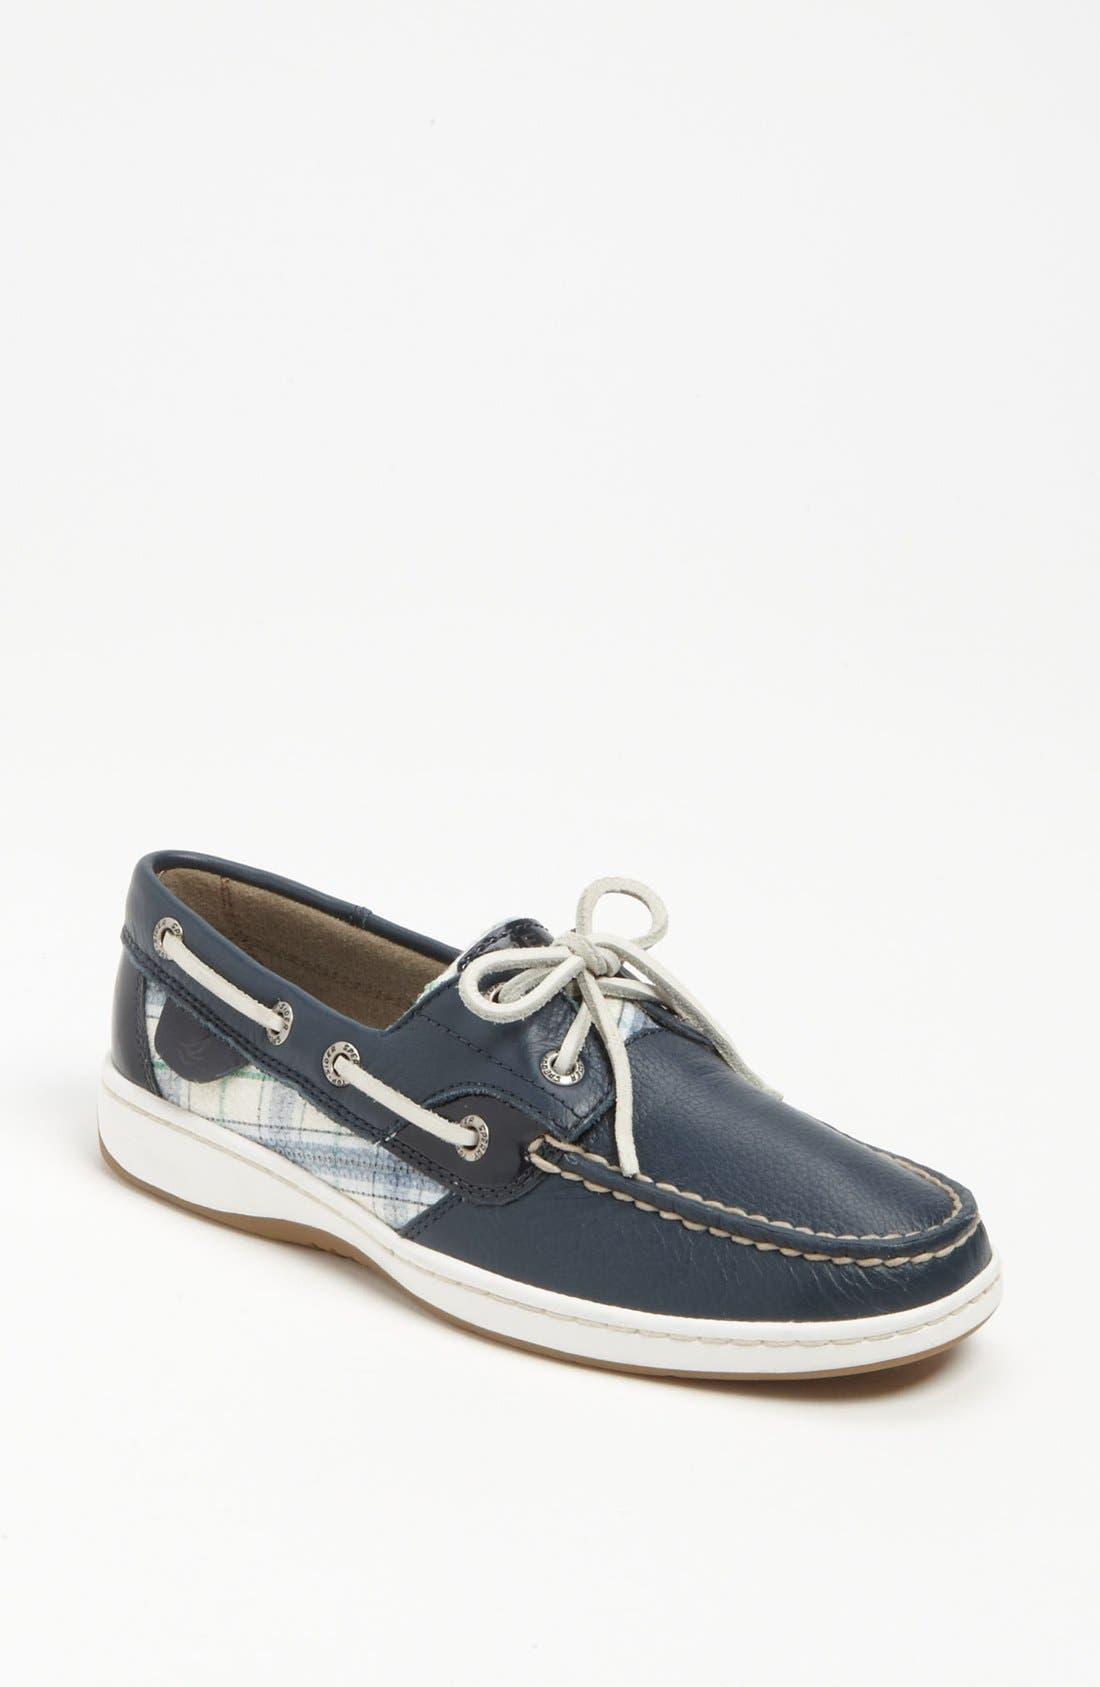 Main Image - Sperry Top-Sider® 'Bluefish 2-Eye' Boat Shoe (Women)